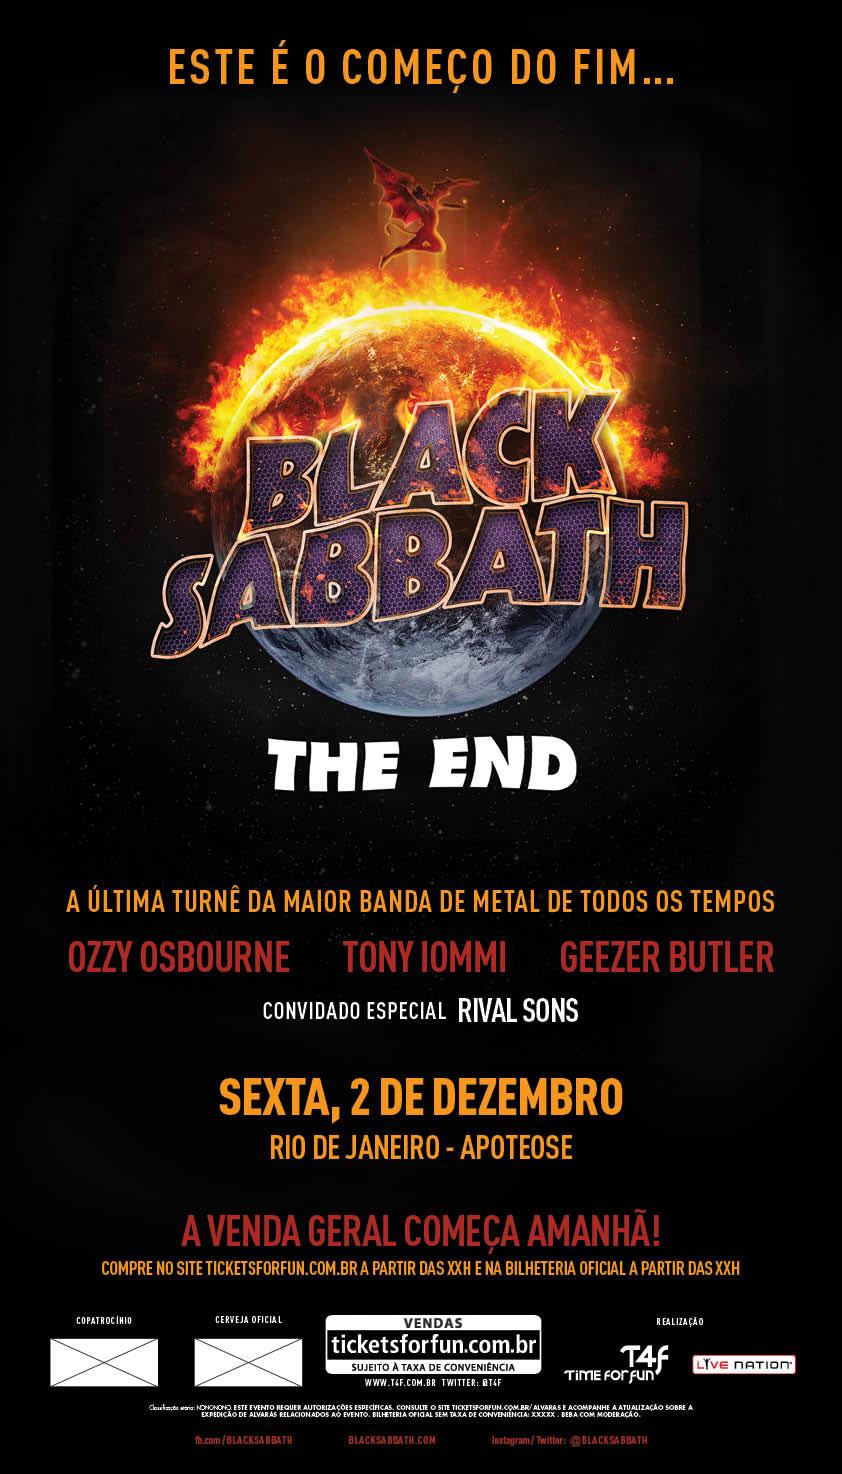 black sabbath extends tour to brazil the official ozzy osbourne site. Black Bedroom Furniture Sets. Home Design Ideas